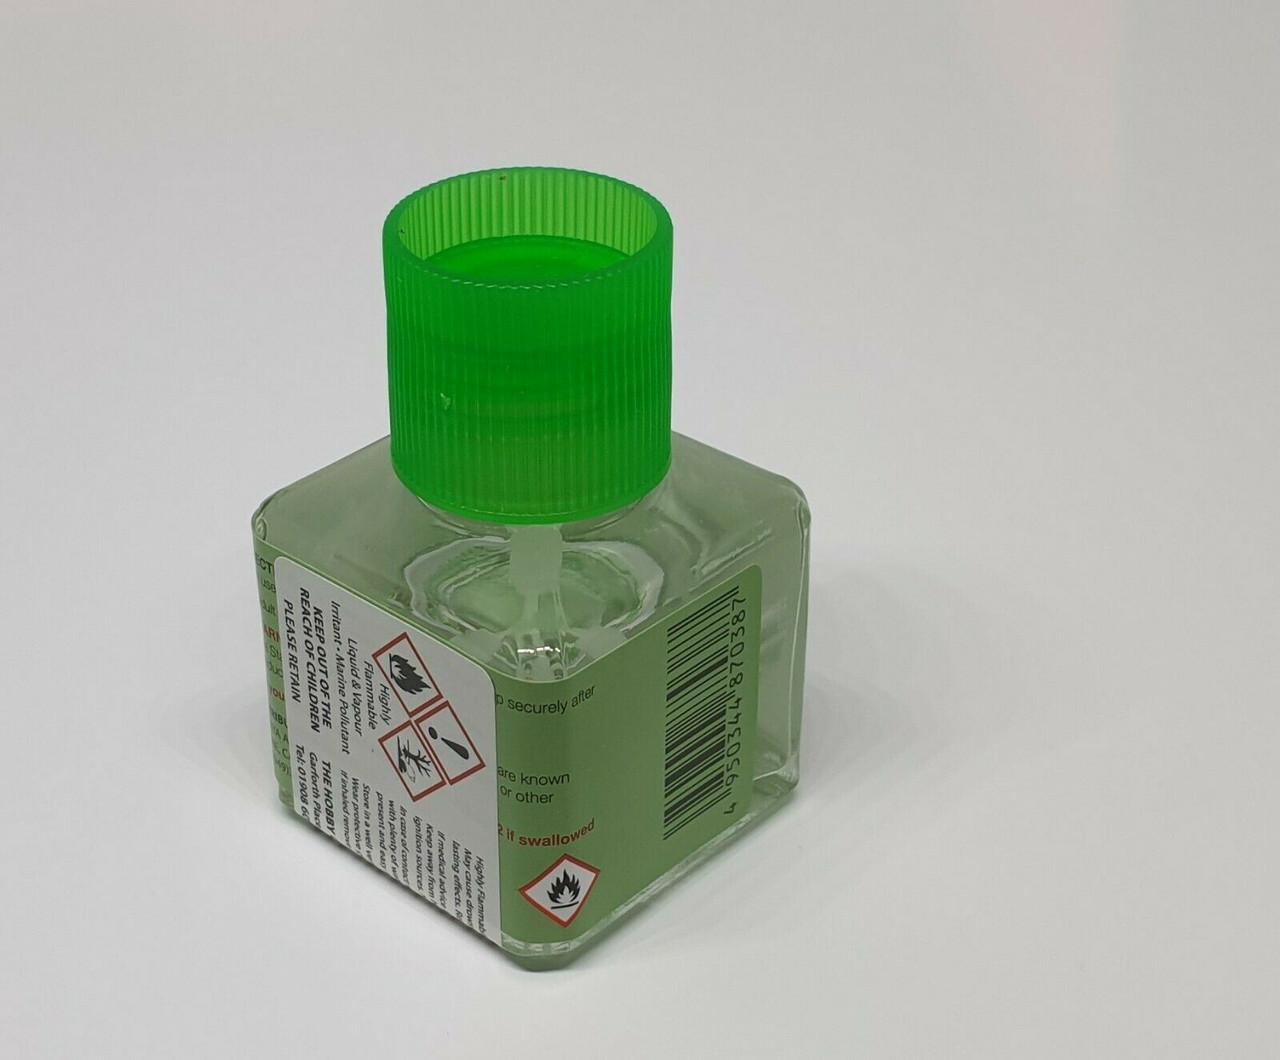 Tamiya Extra Thin Cement 40ml Tamiya  Brand New in Box TAM-87038